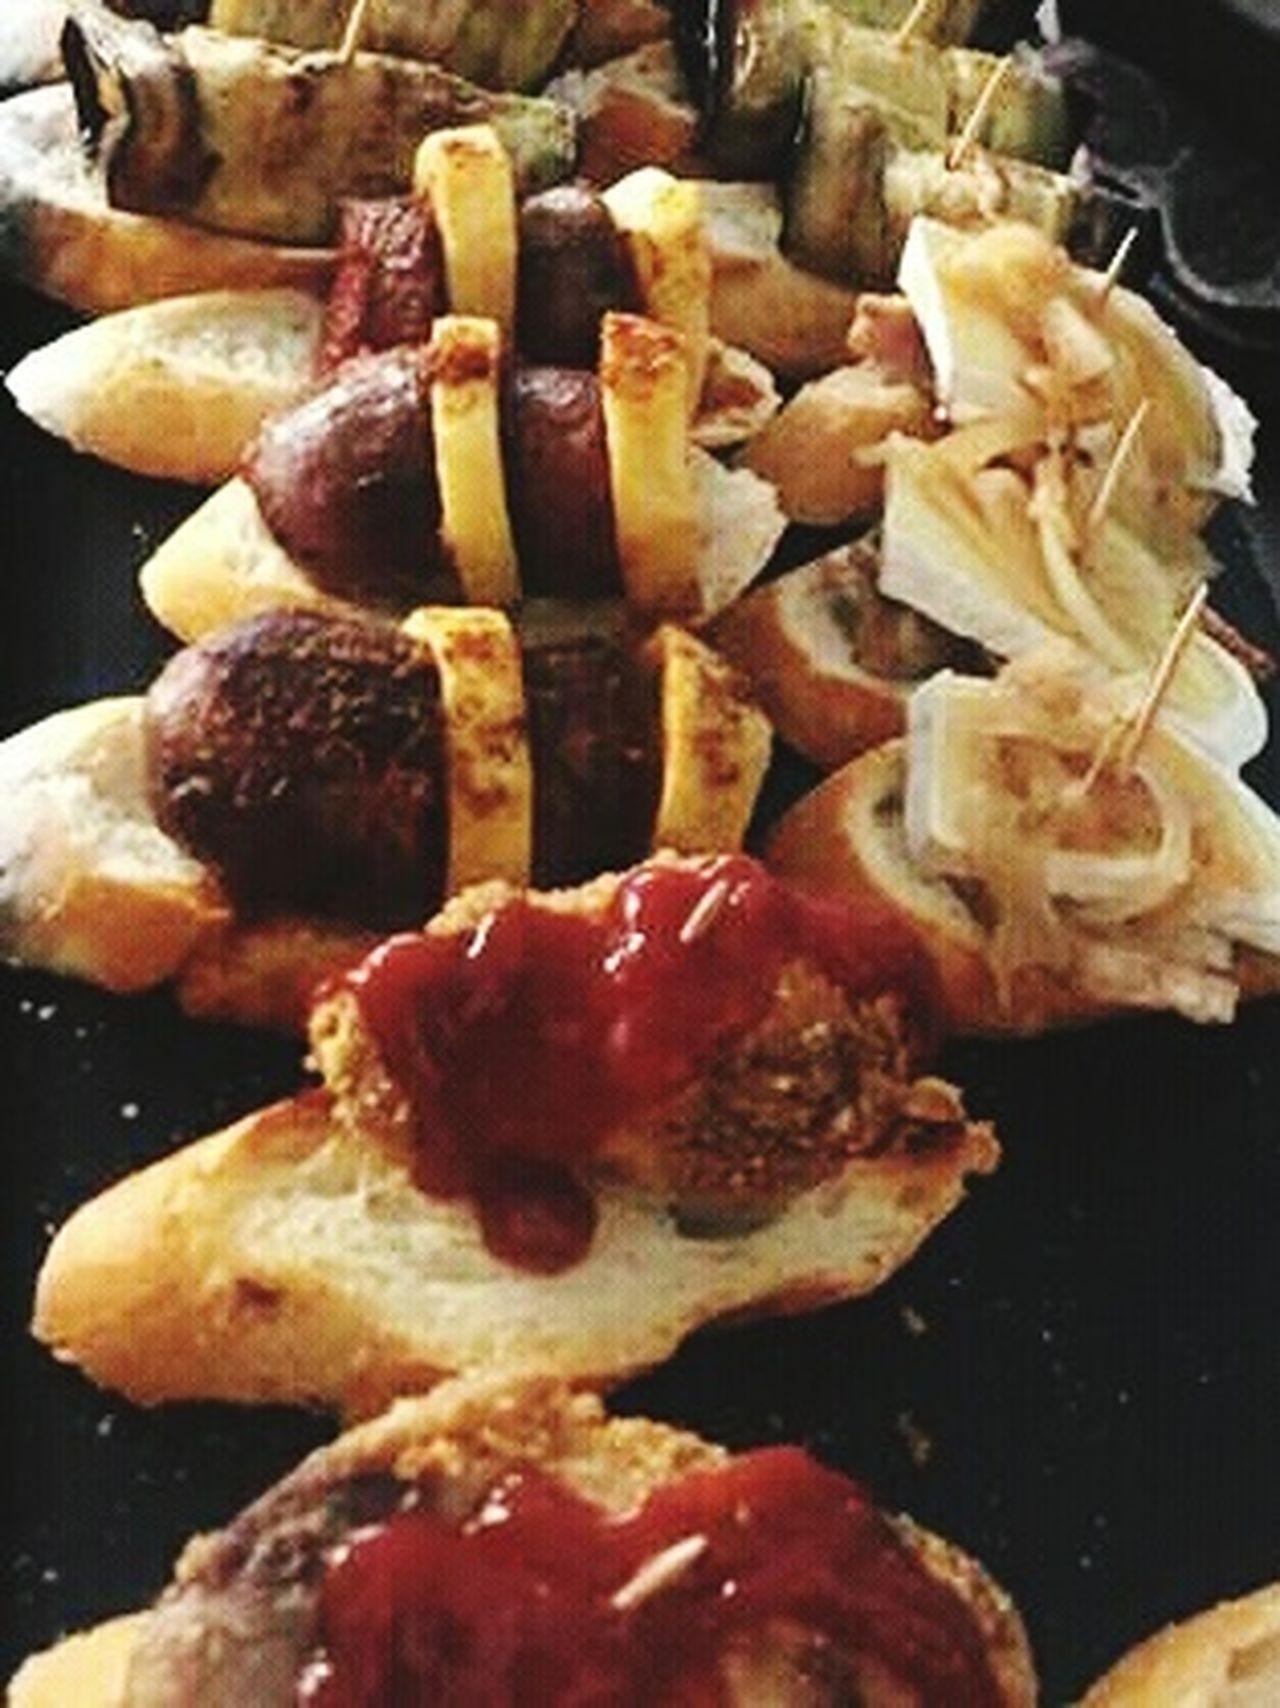 Comida(: Comidas Montaditos Montadito Tapas Restaurant Scene Restaurant Food Restaurante Restaurants Restaurant Decor Restaurant Bar